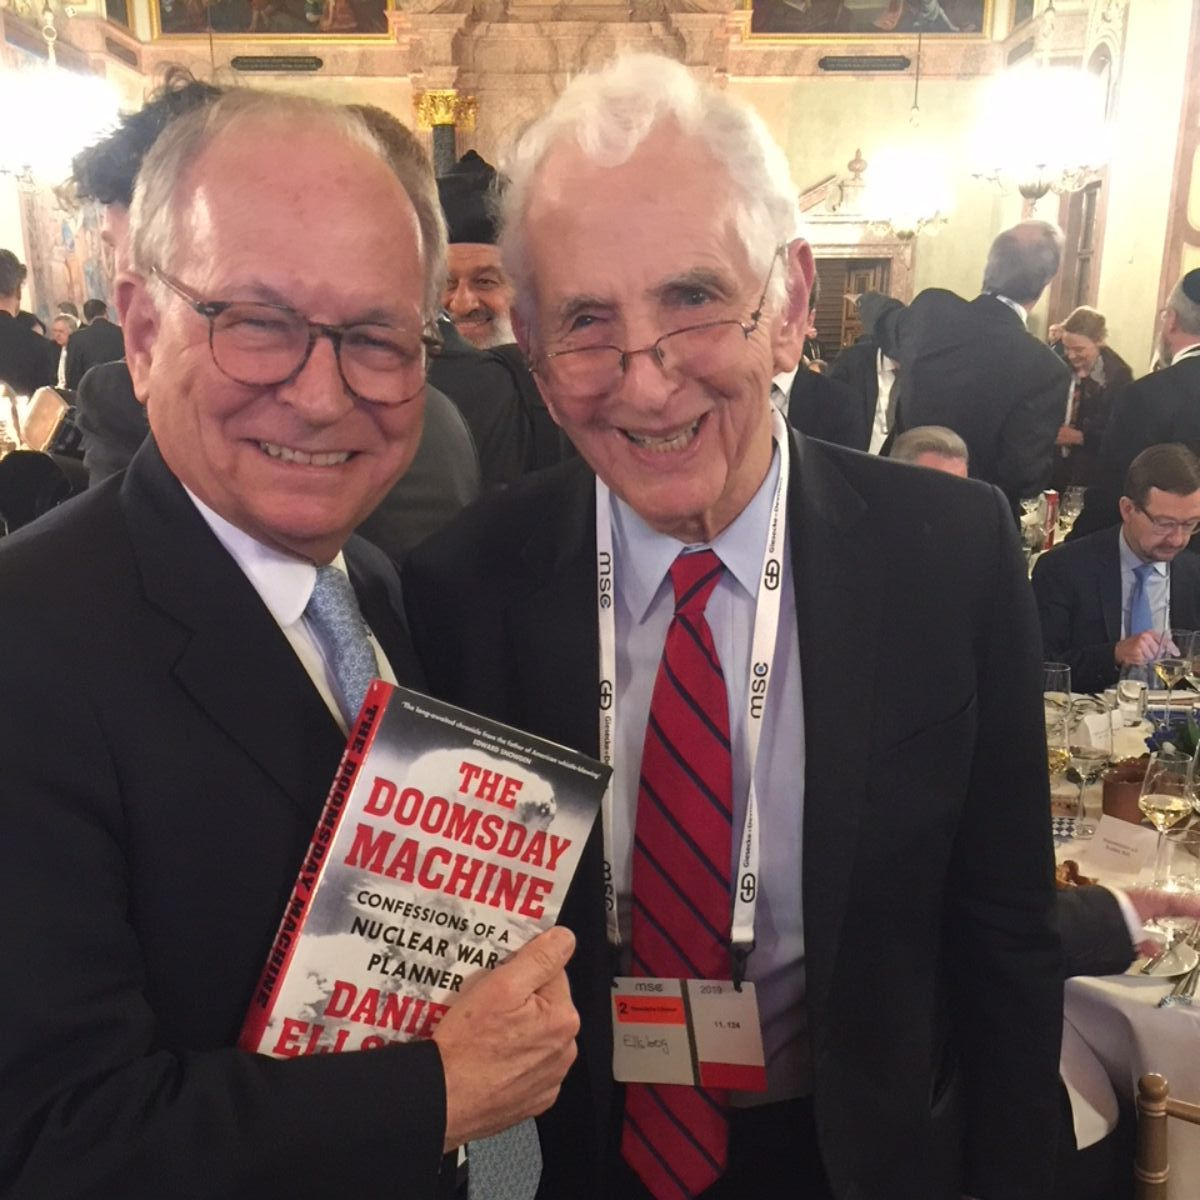 MSC chairman Ischinger with Ellsberg's book.